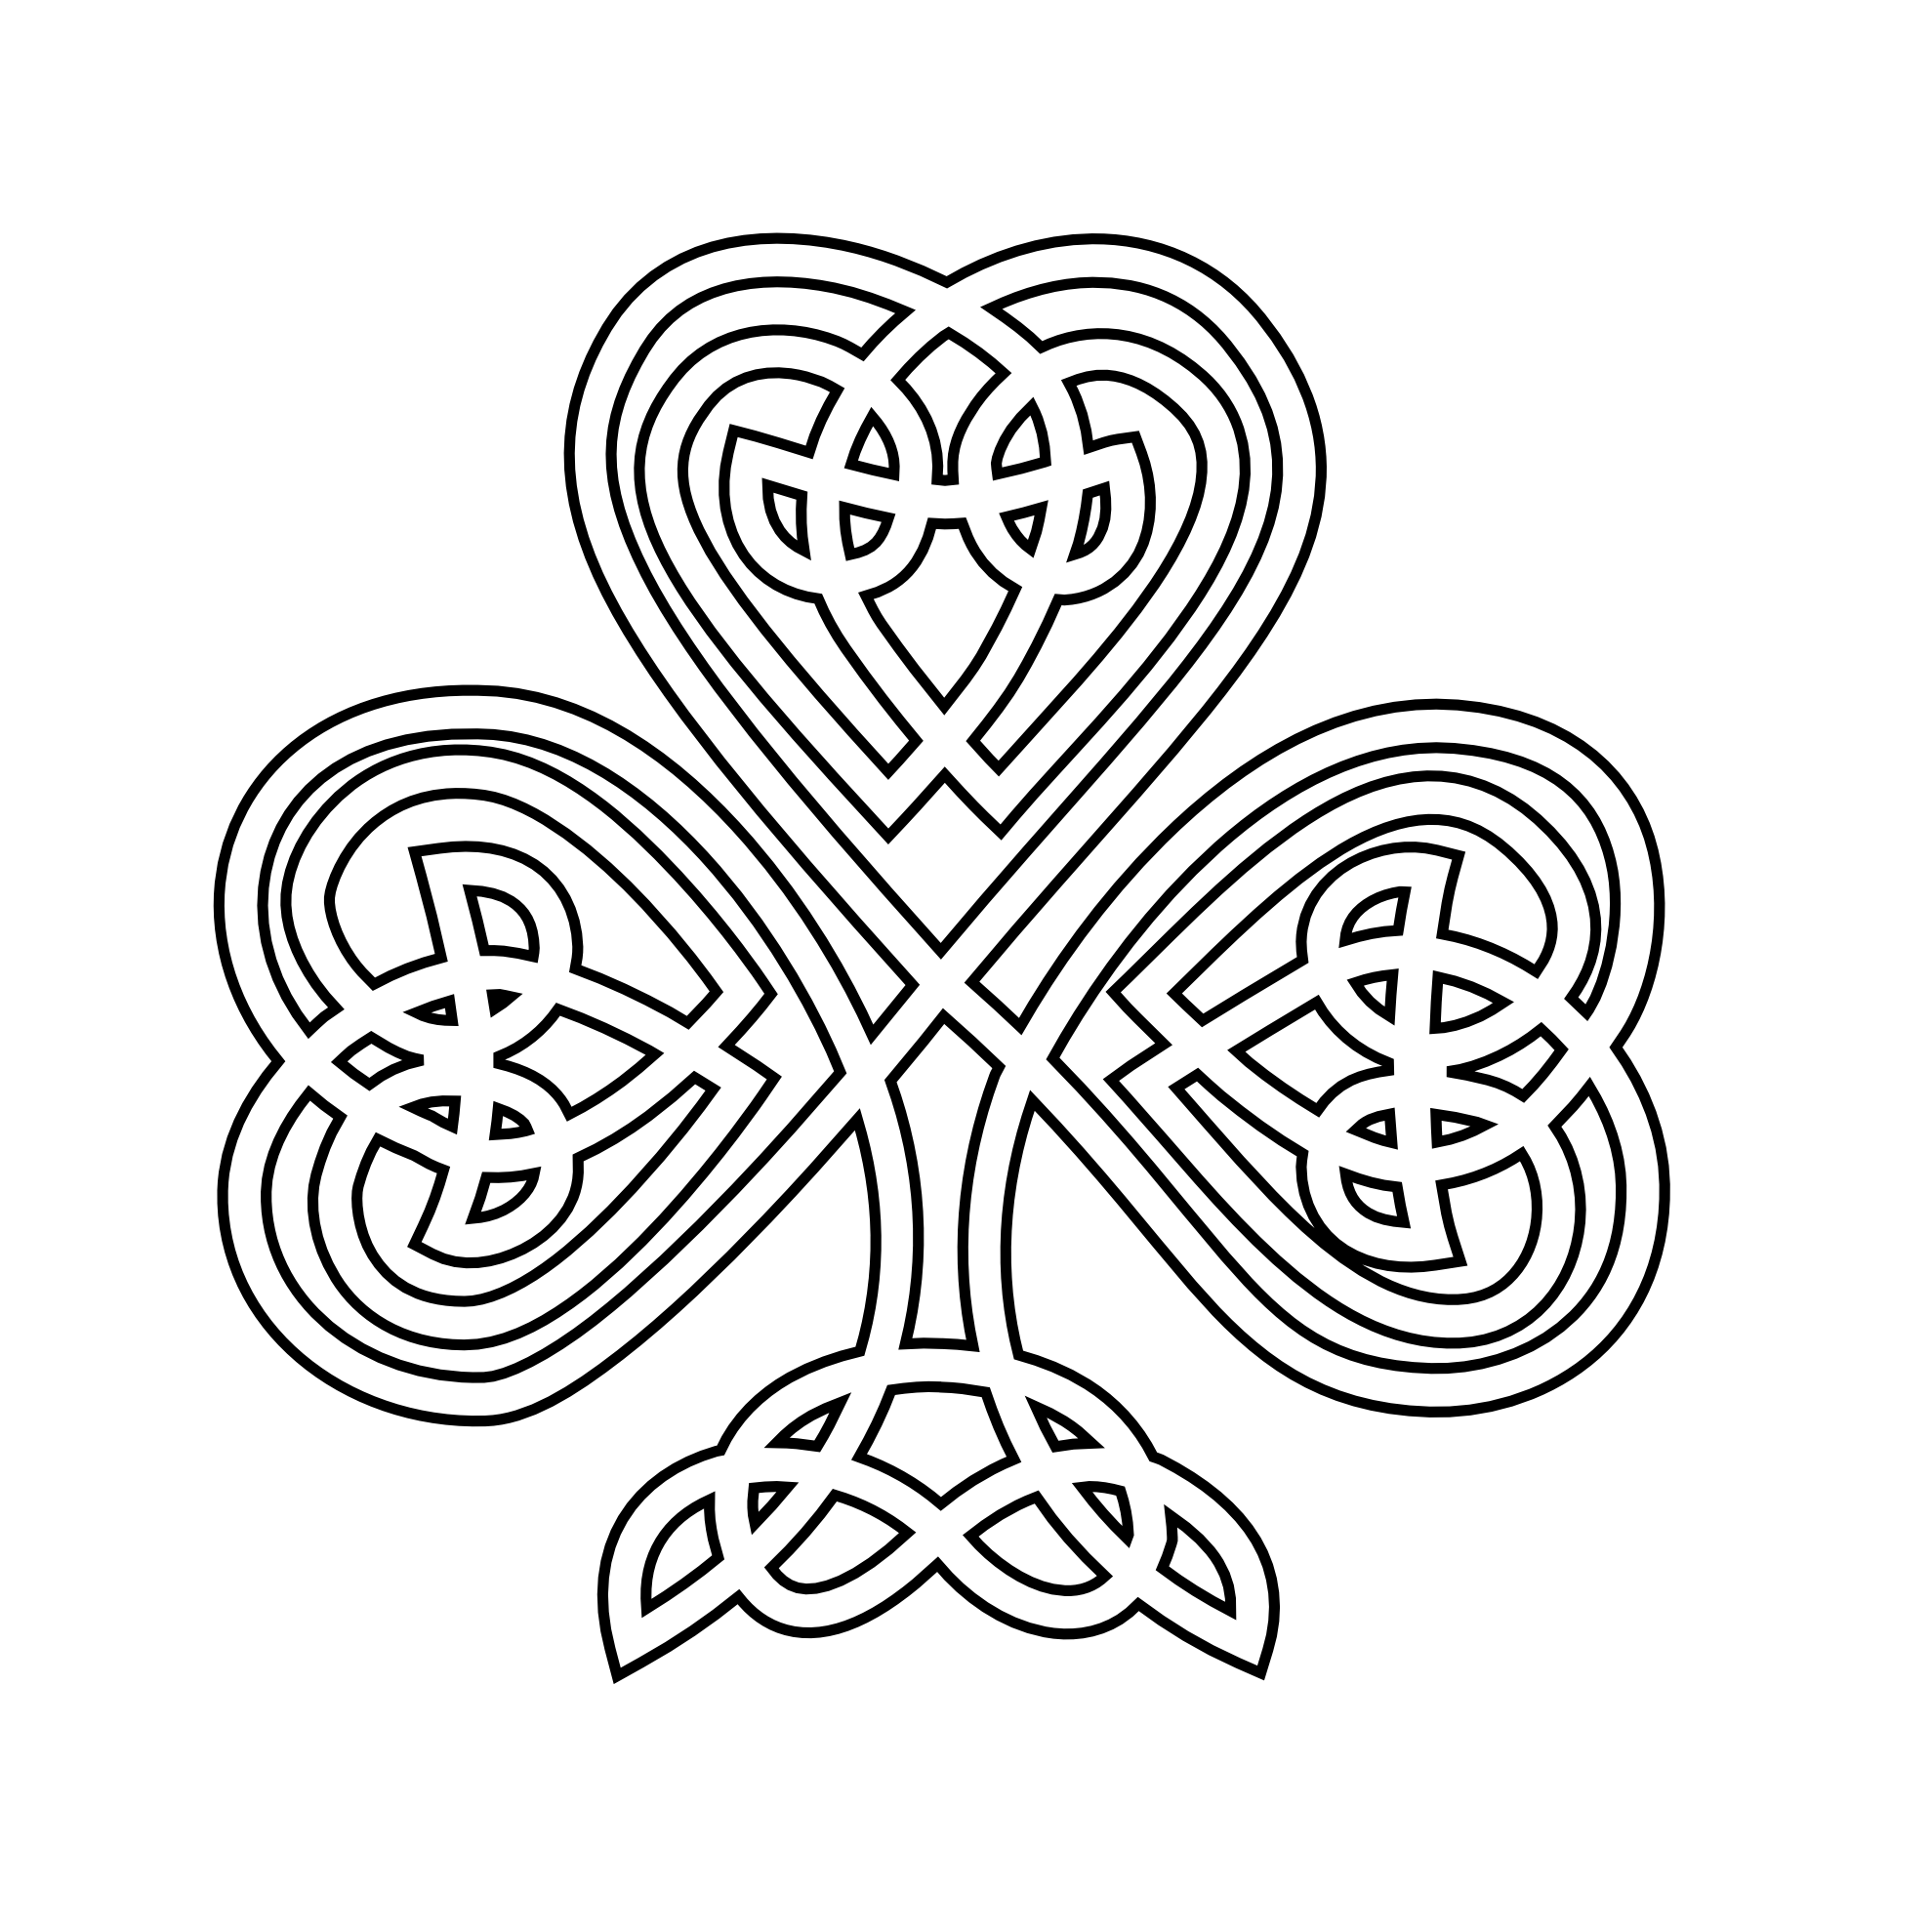 Artistic cross clipart svg library library shamrock | Celtic Shamrock Black White Line Flower Art Coloring ... svg library library